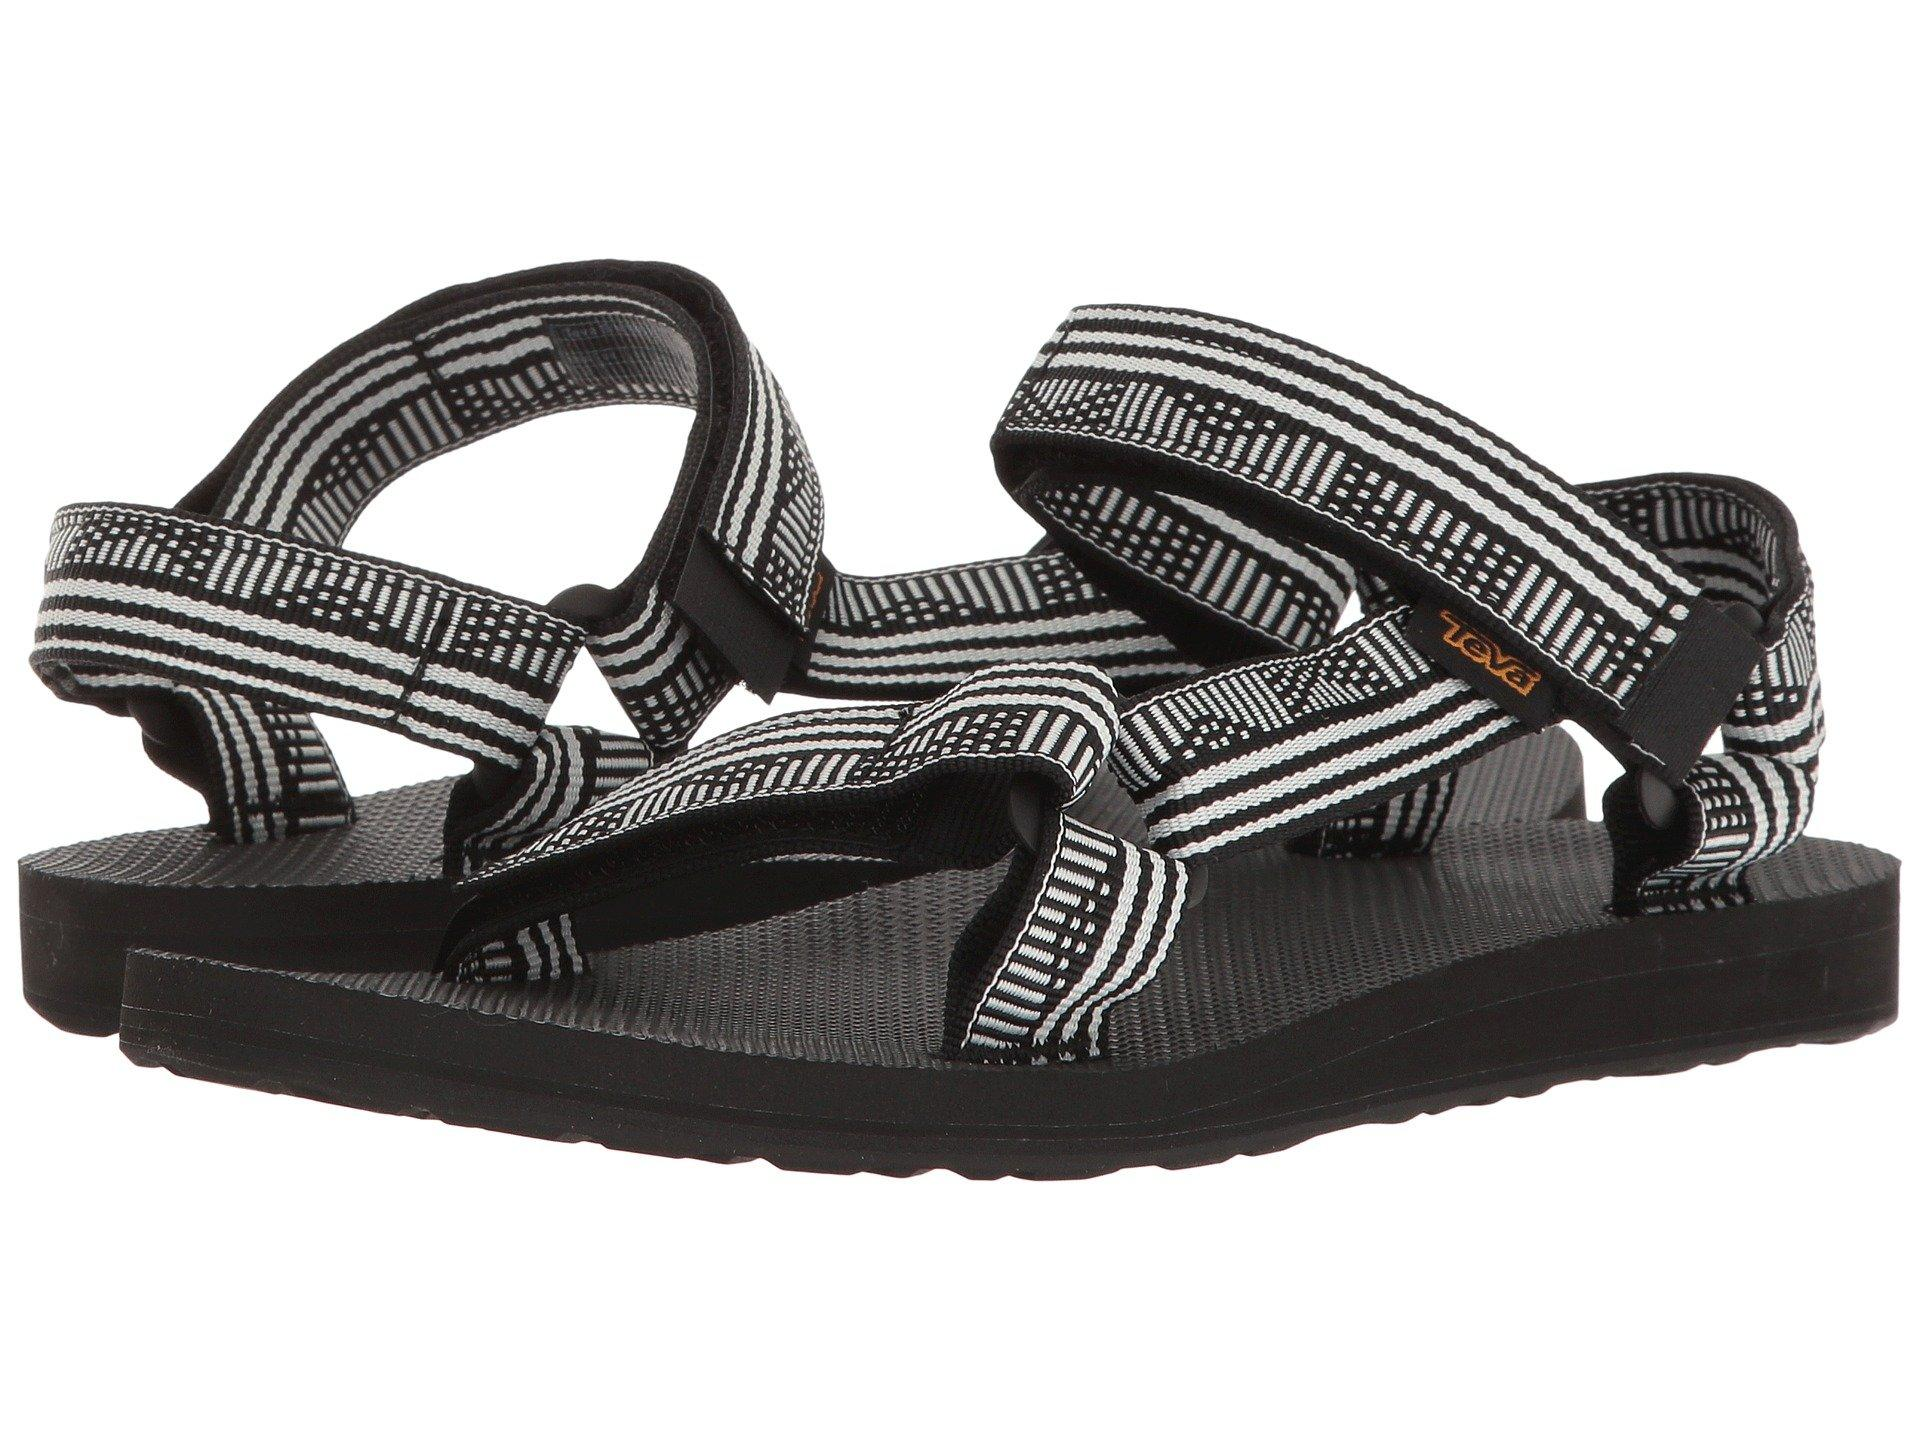 1c6fe9497602 Lyst - Teva Original Universal (bright White) Women s Sandals in Black